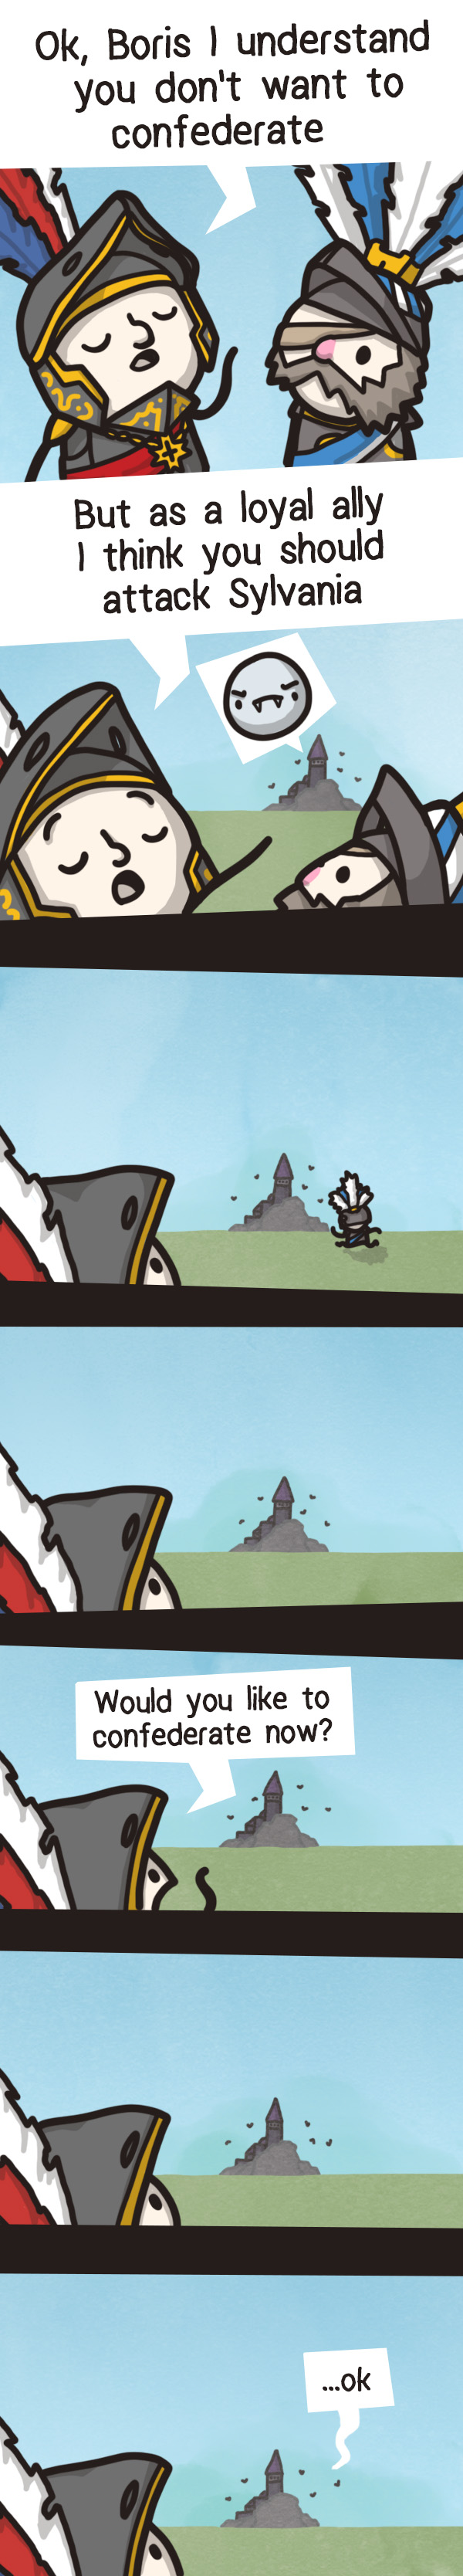 Warhammer Total War 2 - Confederating